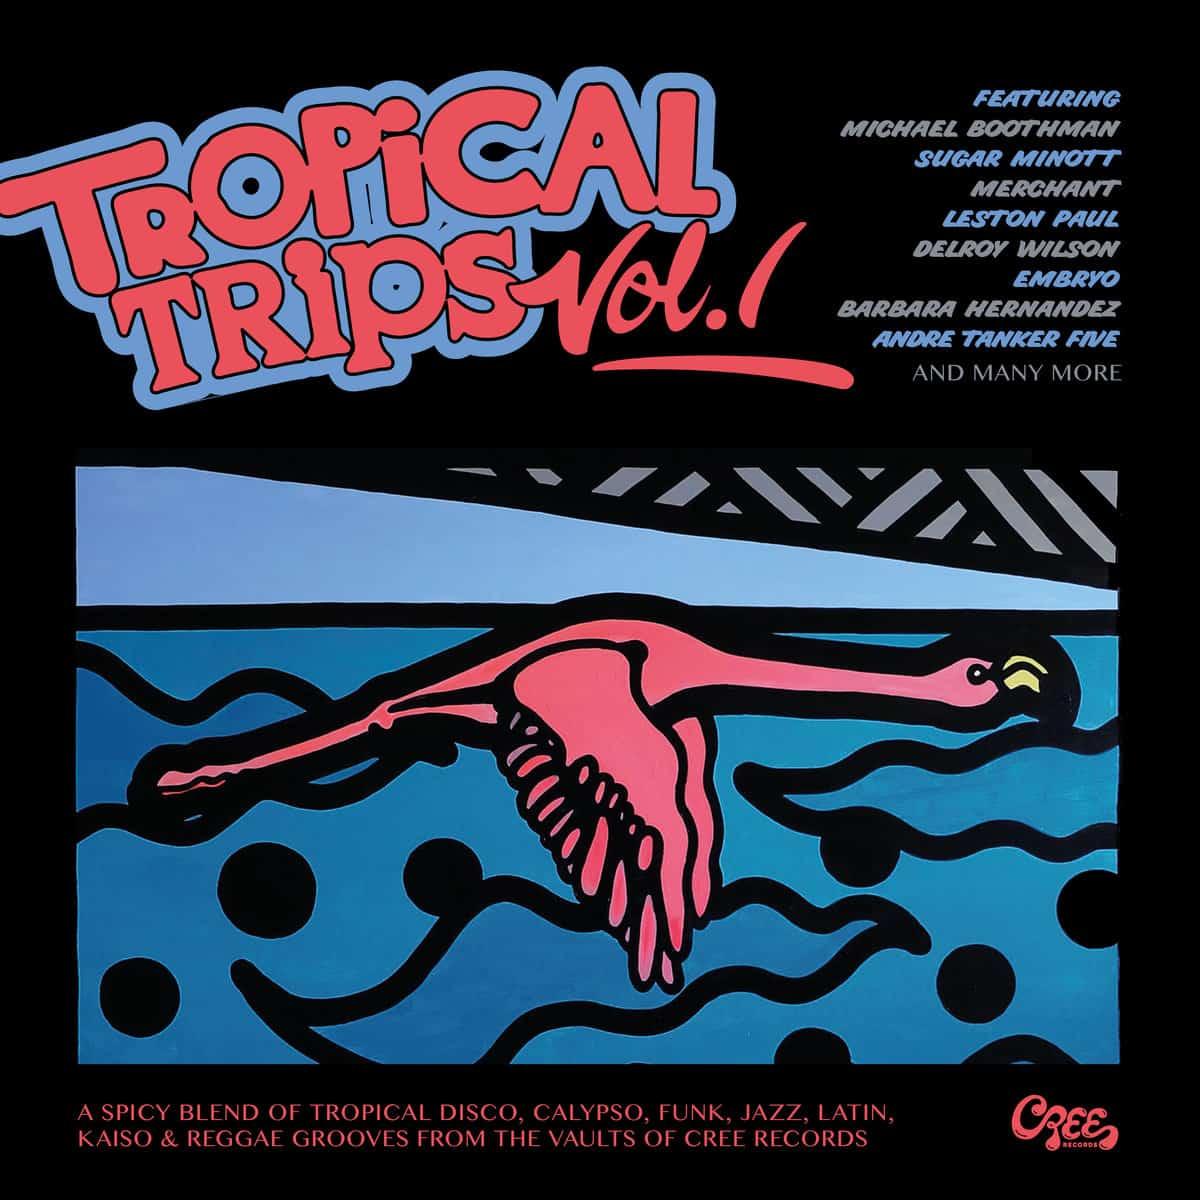 ▶︎ Tropical Trips Vol.1 ♫♪♫♫♪♪